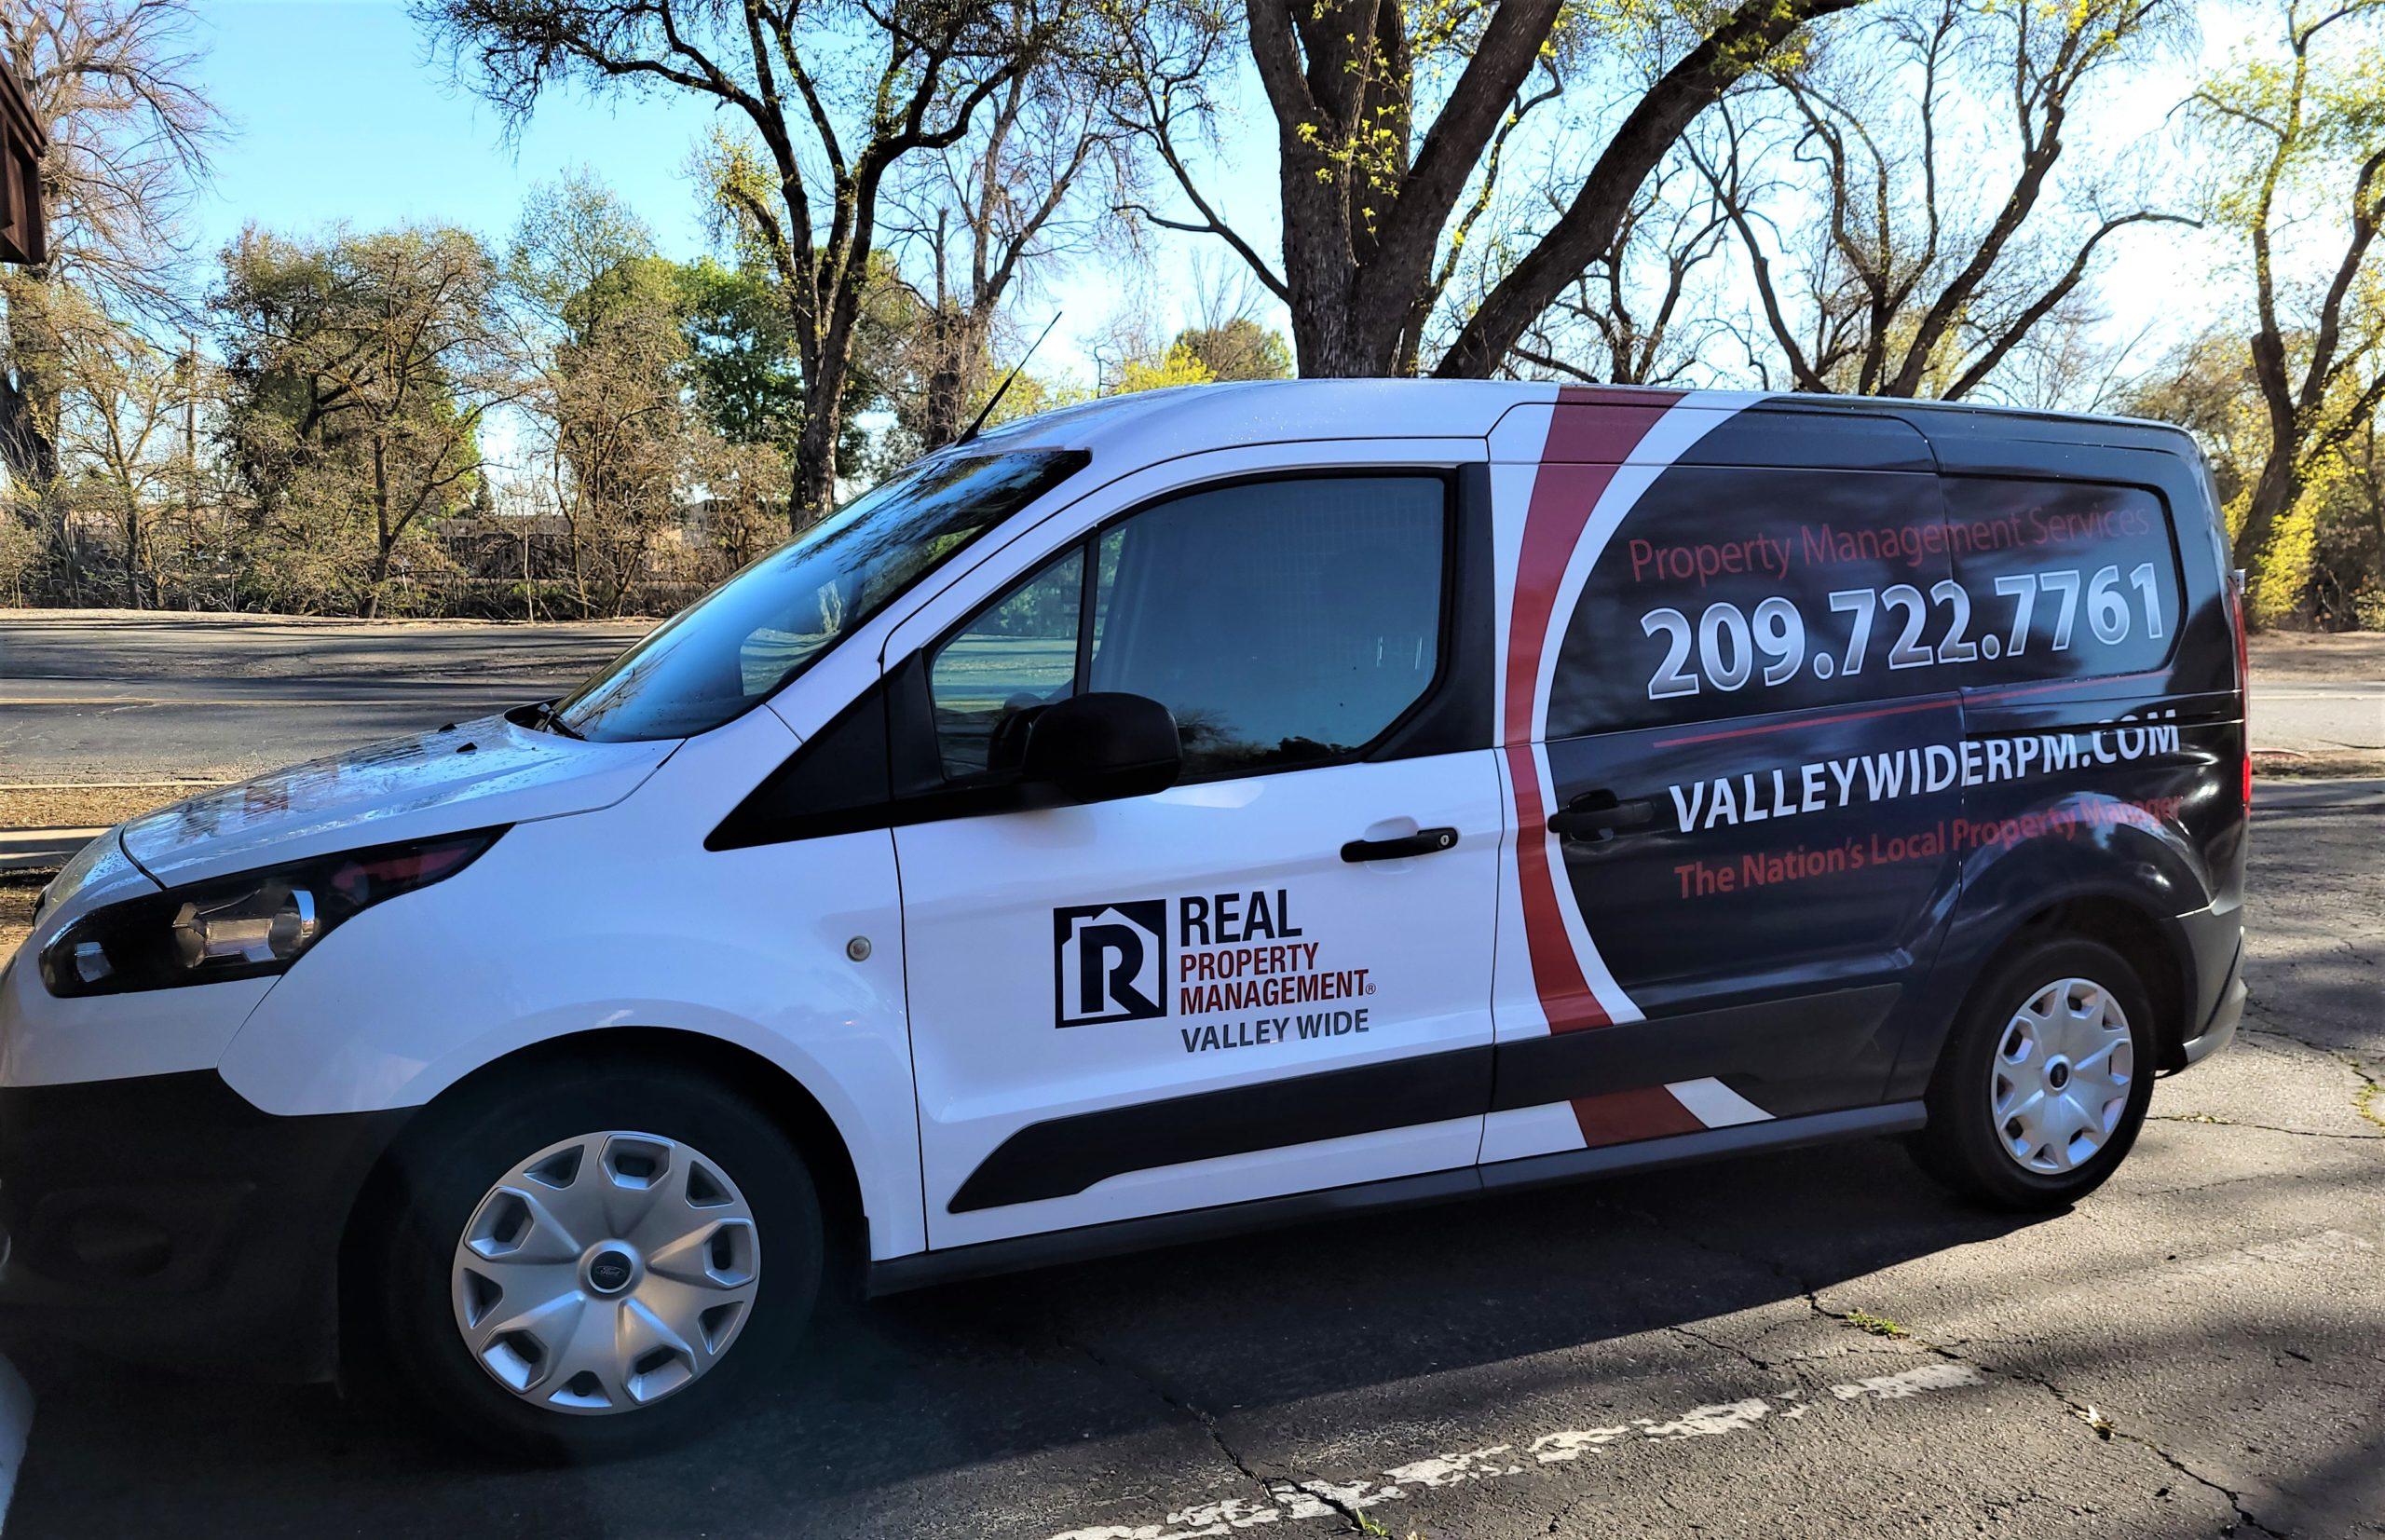 Real Property Management Valley Wide Van